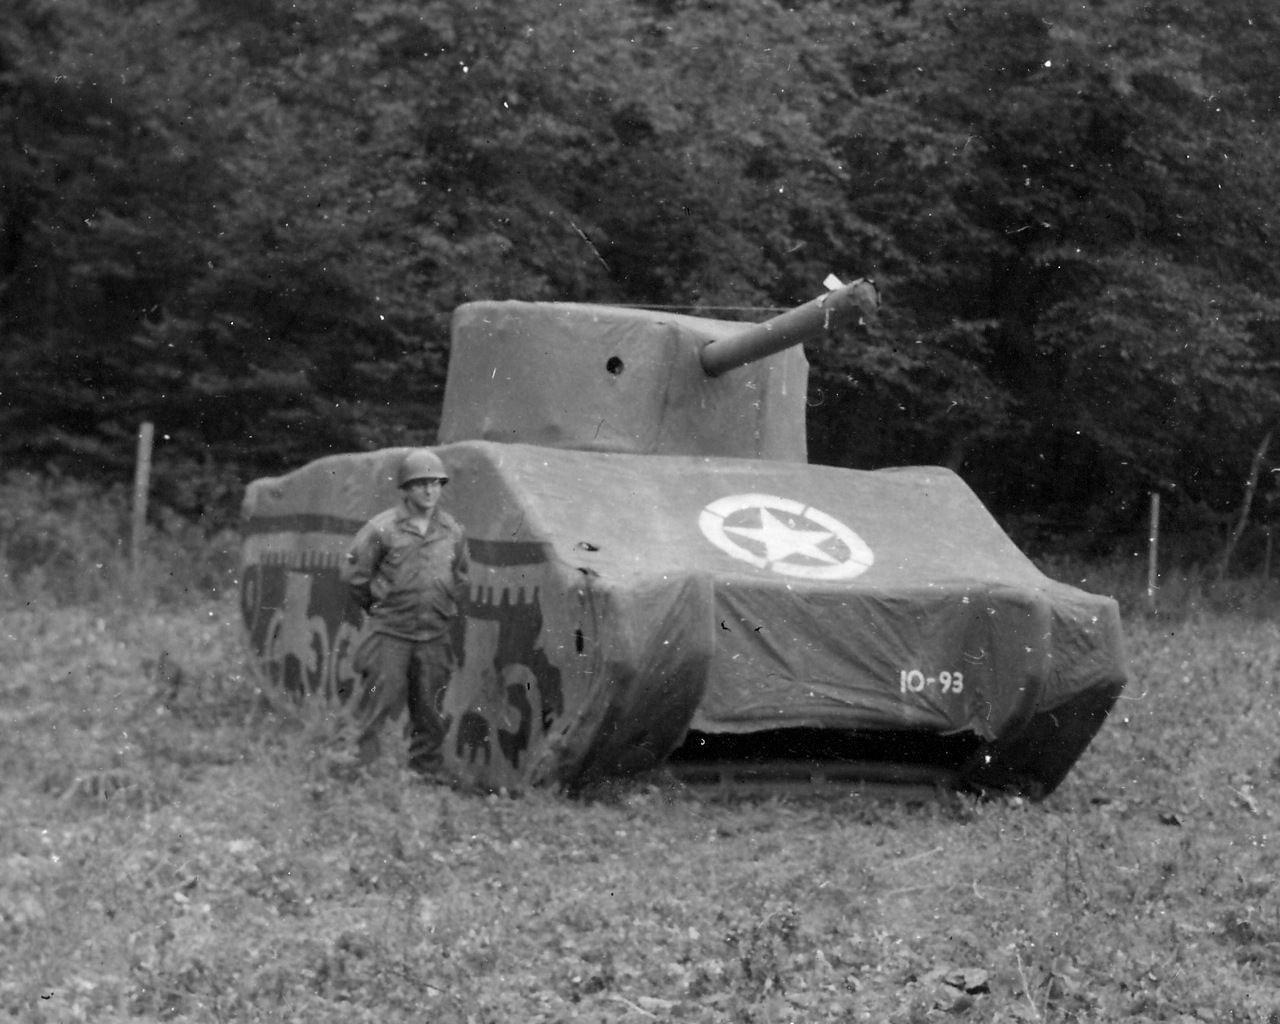 Inflatable Sherman Tank - Autre faux Sherman gonflable en Angleterre avant le DDay